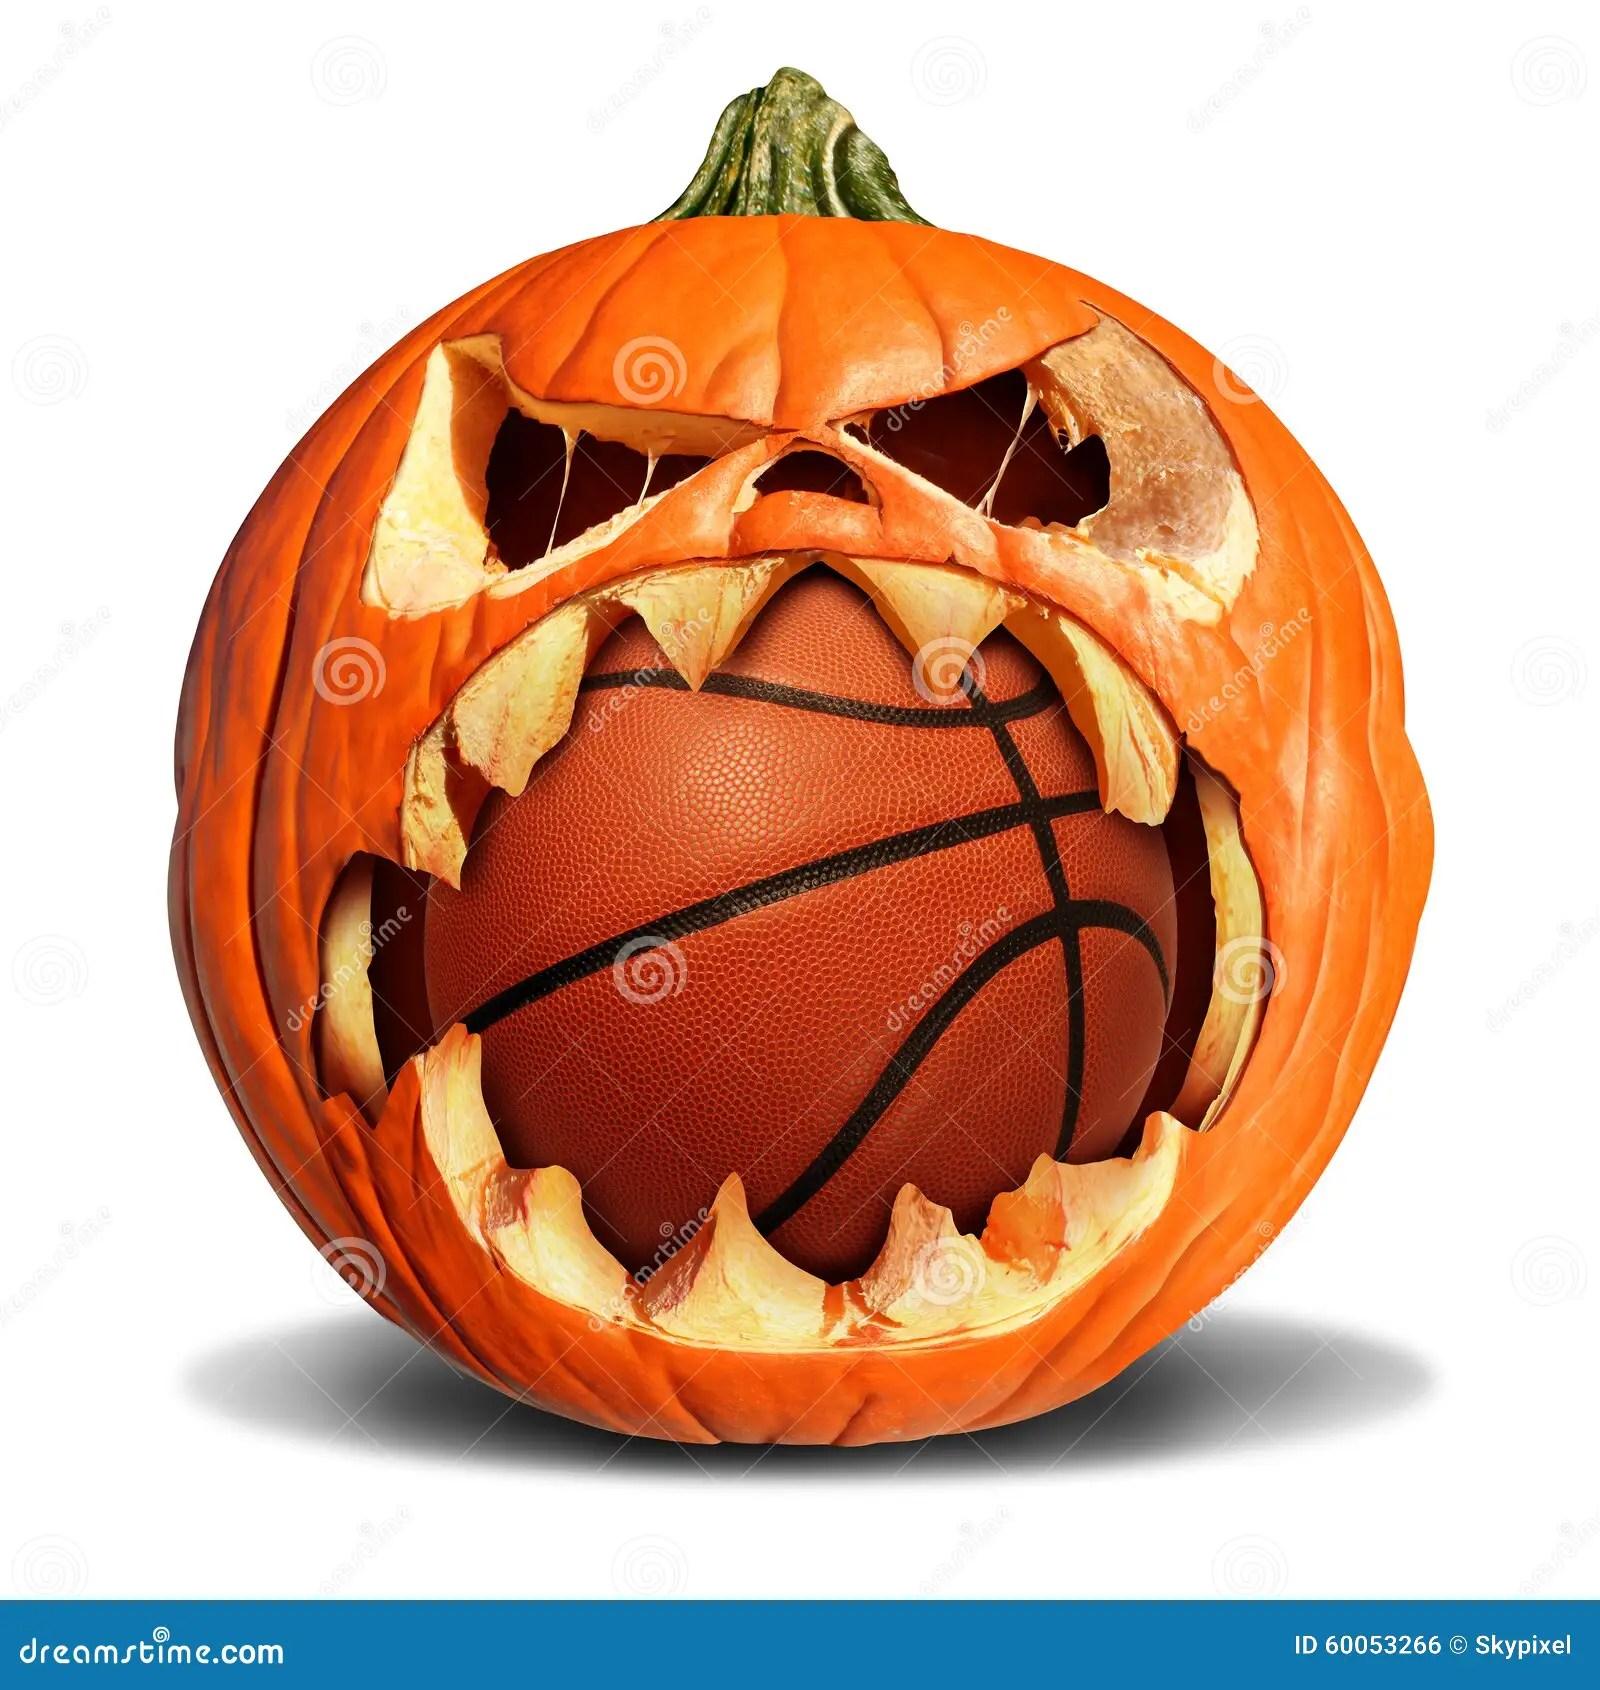 Free Fall Pumpkin Wallpaper Basketball Autumn Stock Illustration Image 60053266